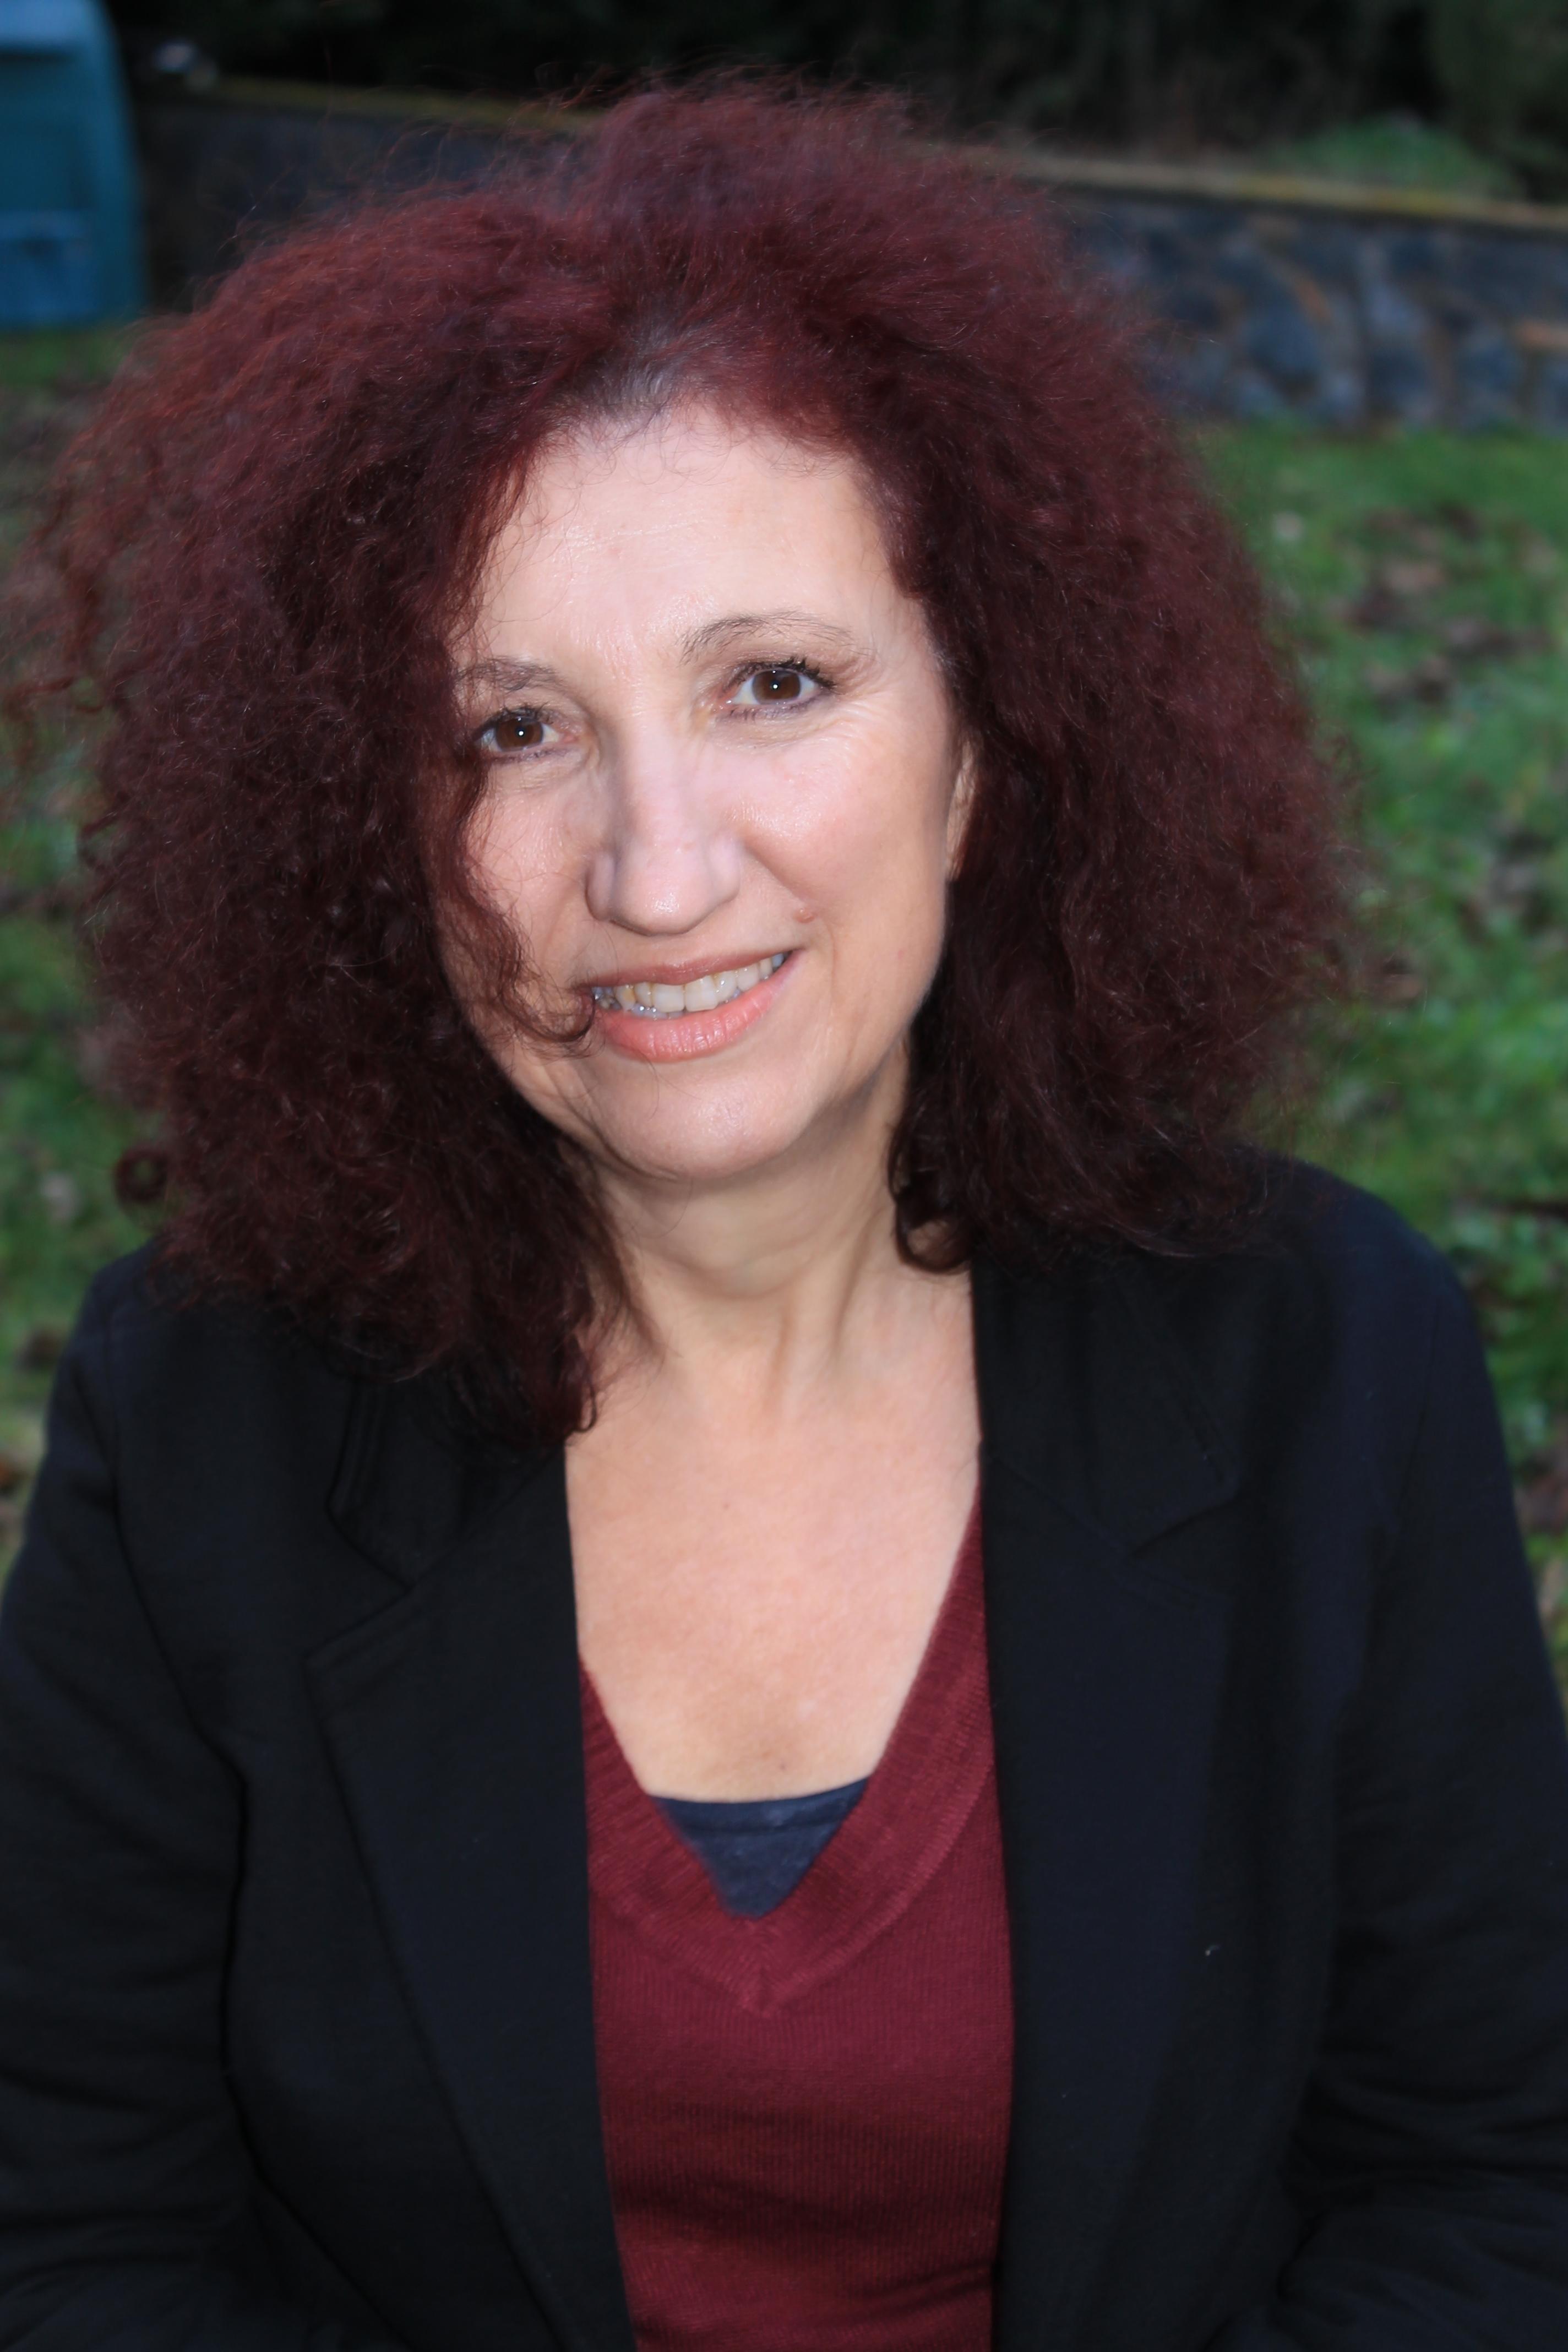 Anna Maria Fausto